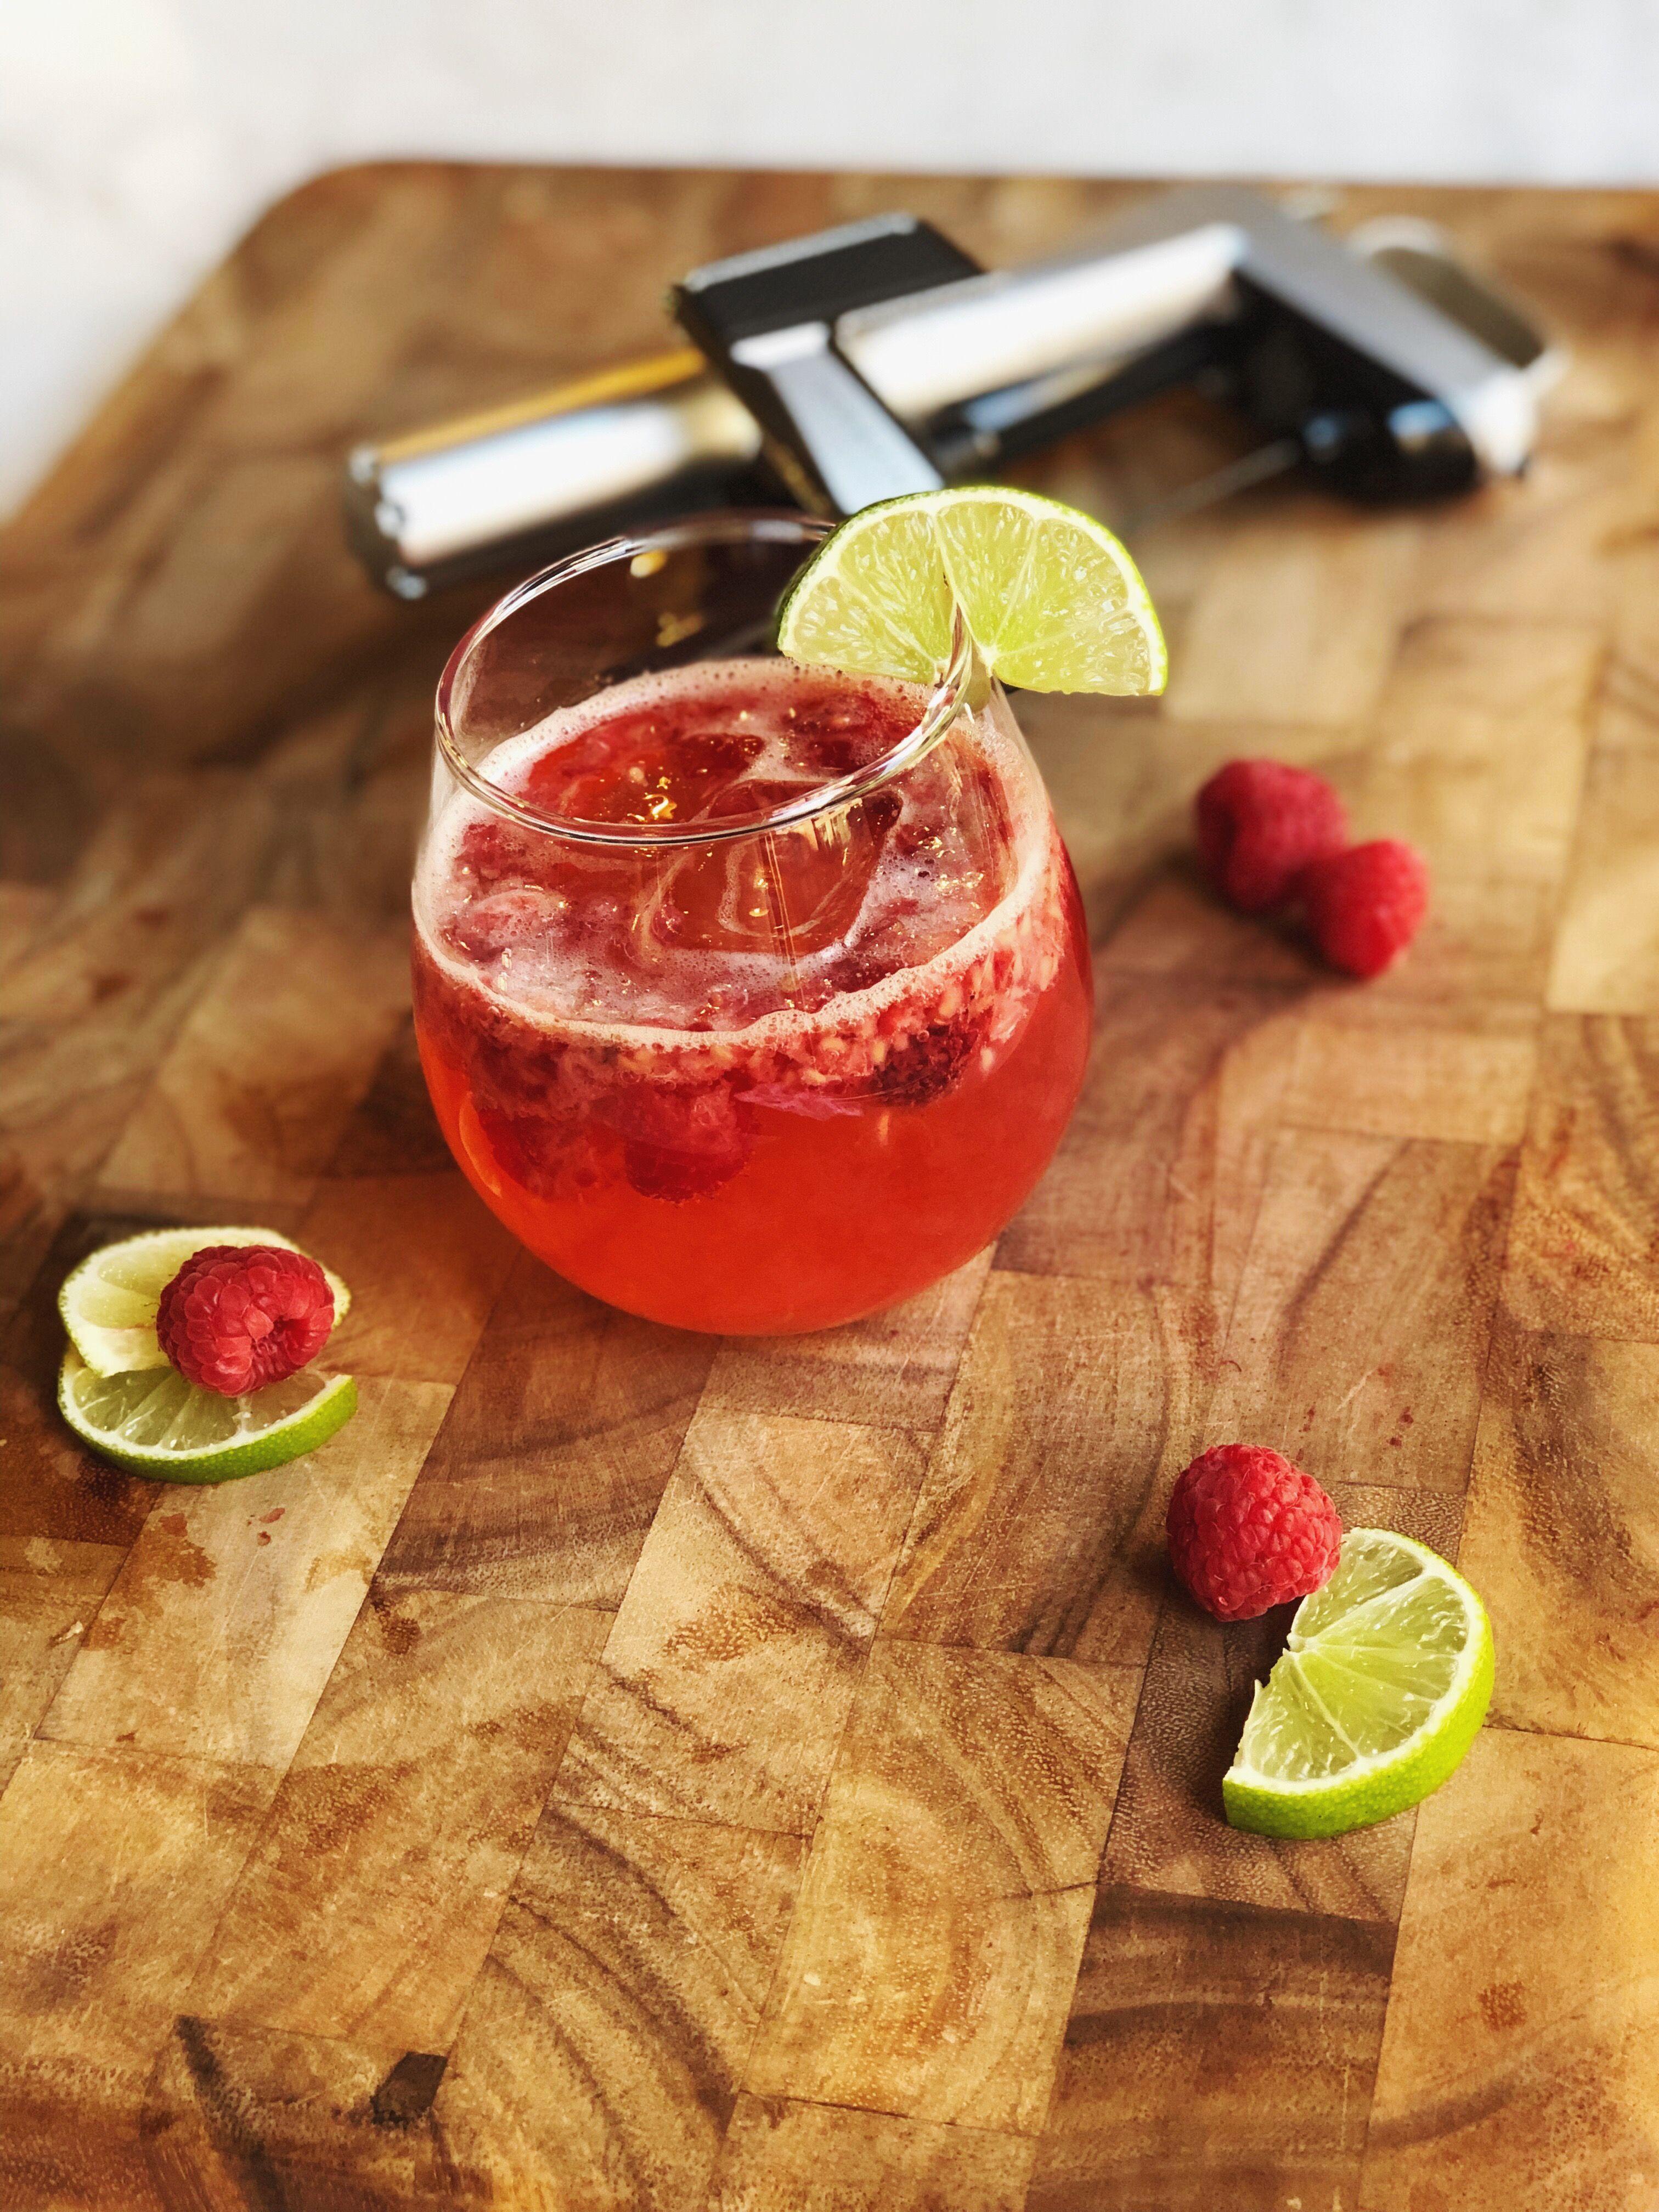 Skinny Raspberry And White Wine Spritzer Raspberry Balsamic Wine Spritzer Raspberry Vinegar Recipes